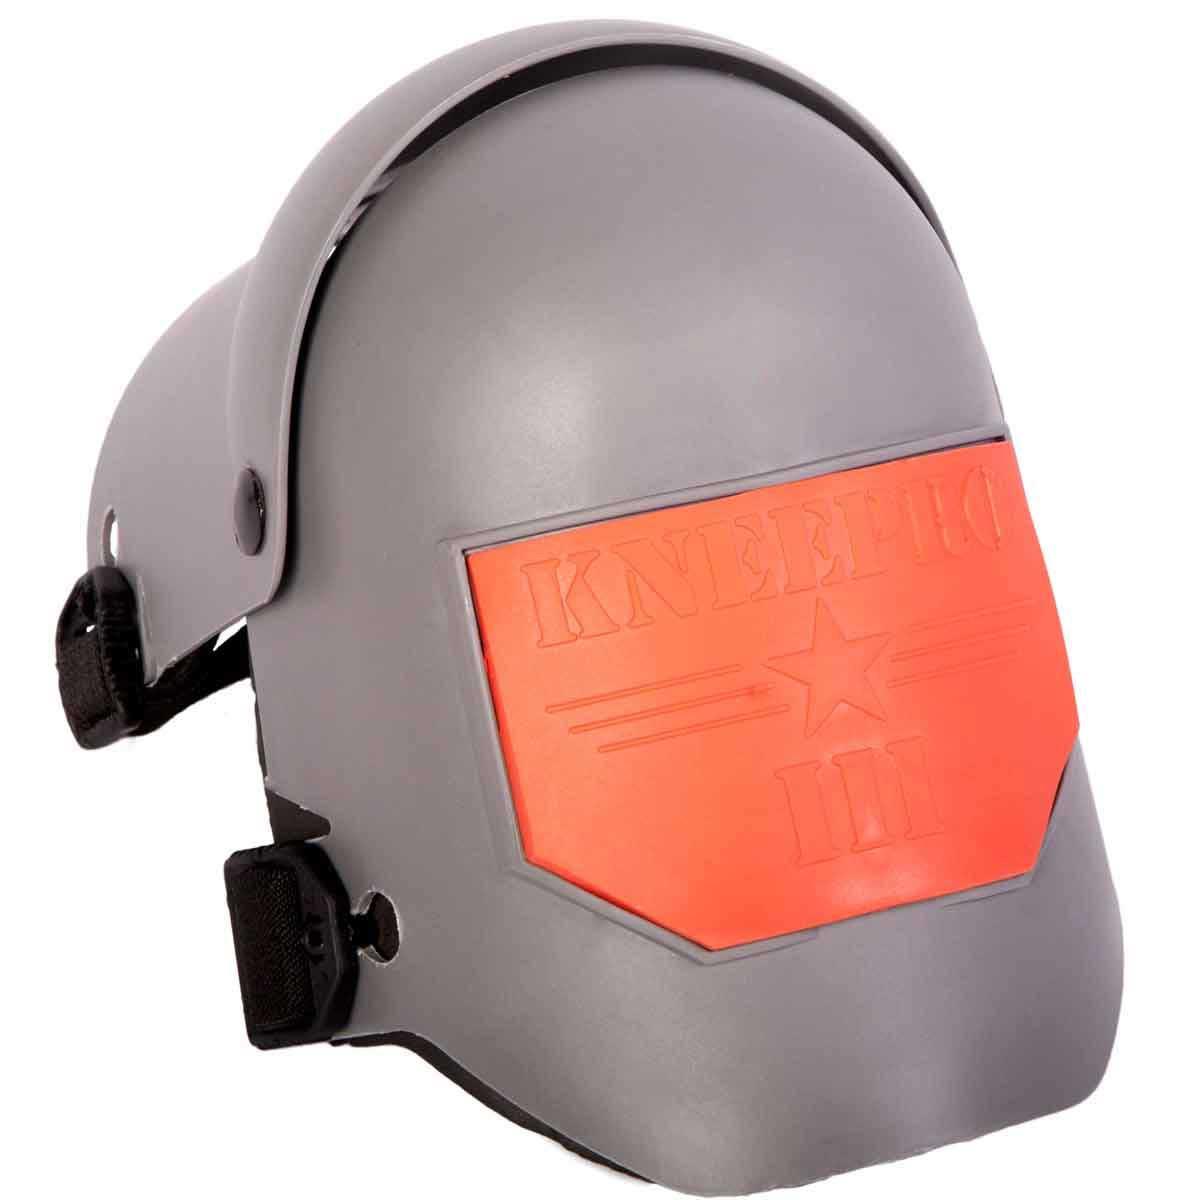 KP Industries Knee Pro Ultra Flex